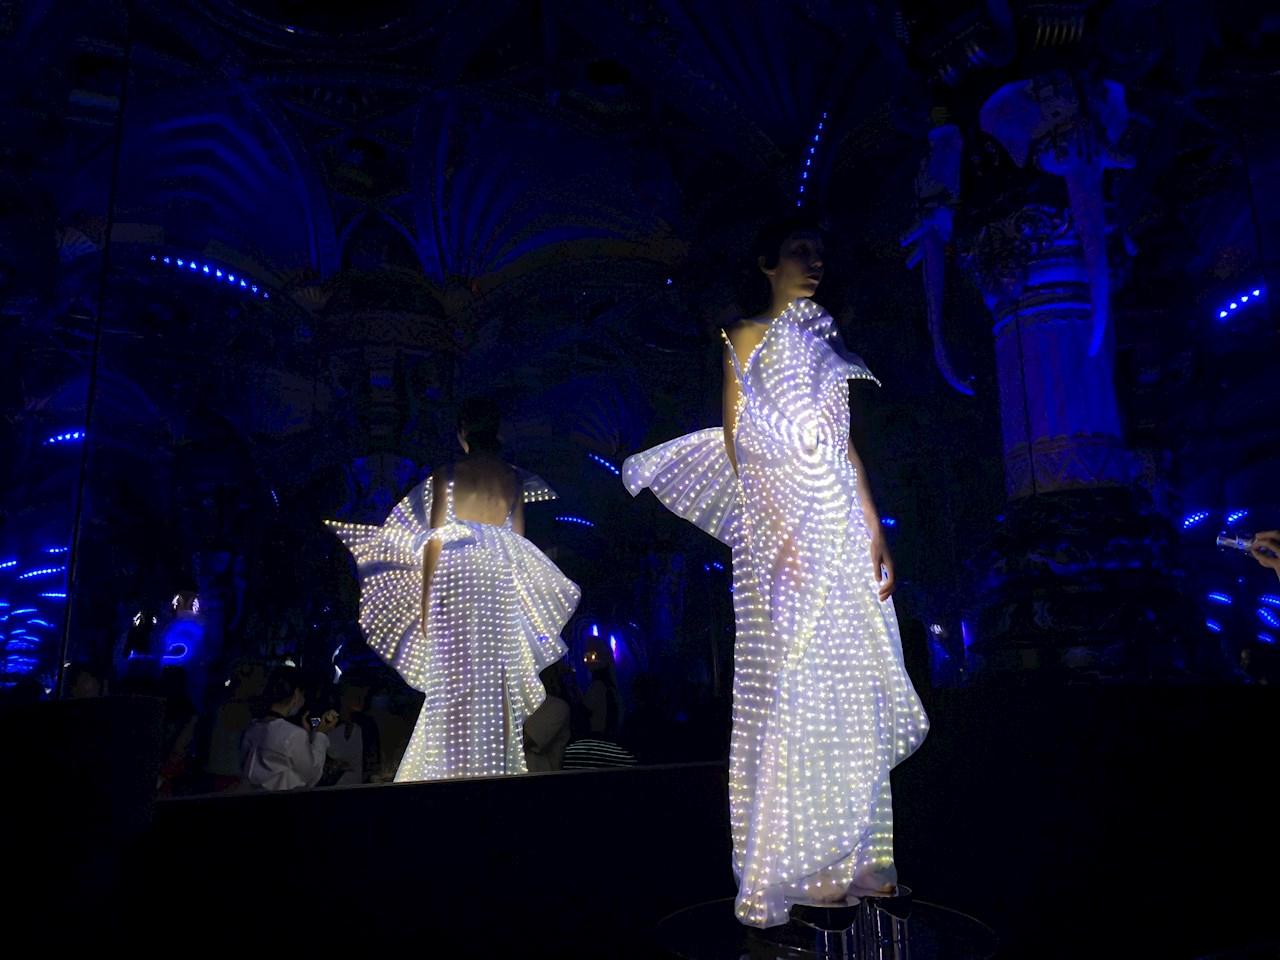 Google colabora con diseñadora para crear vestidos luminosos